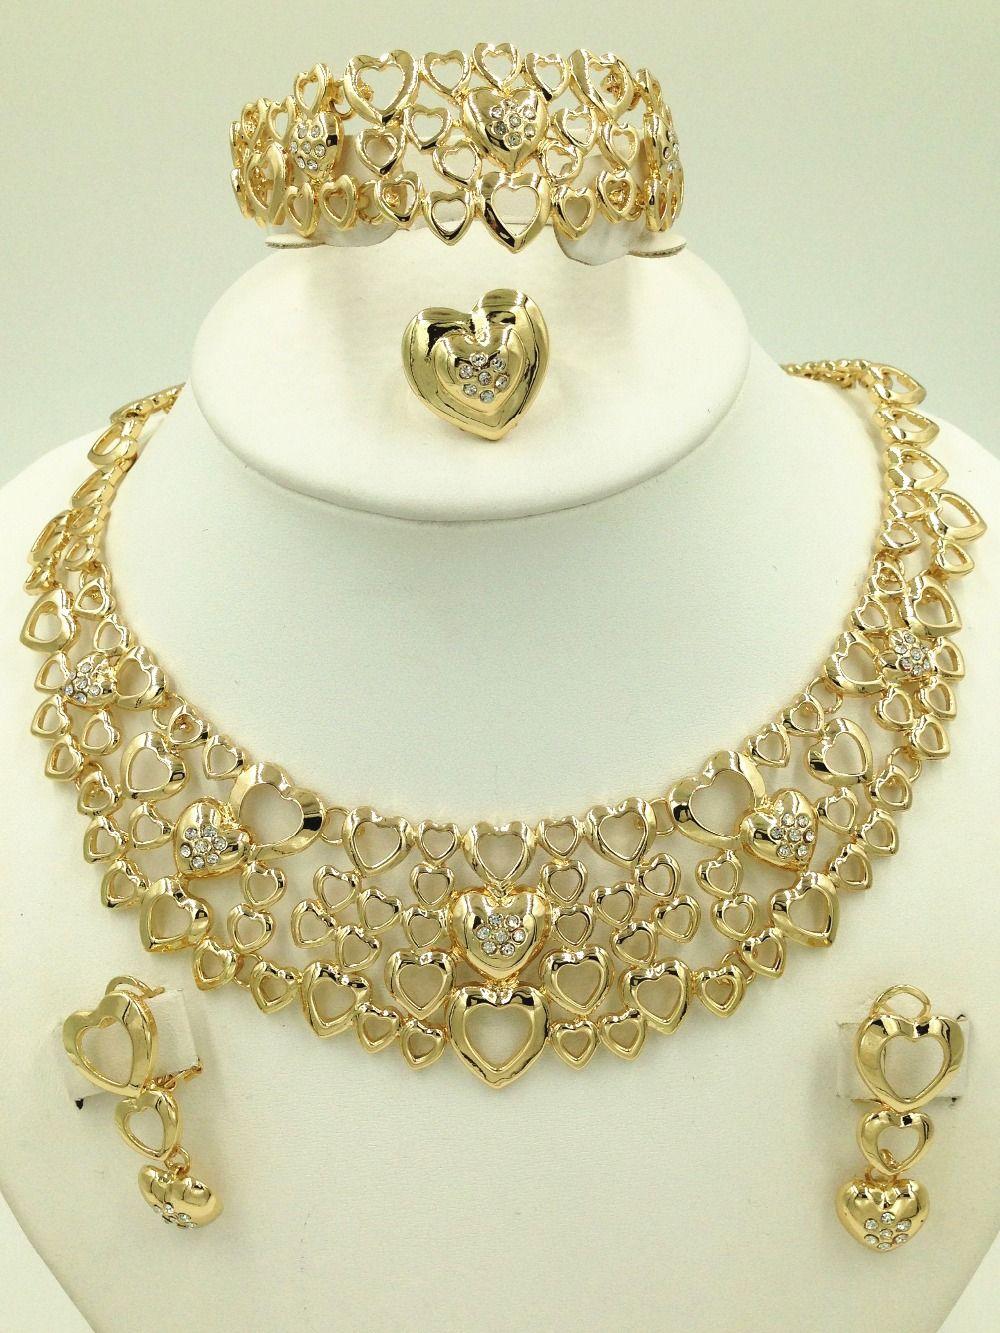 Nigeria gold plated wedding jewelry sets fashion women Dubai gold